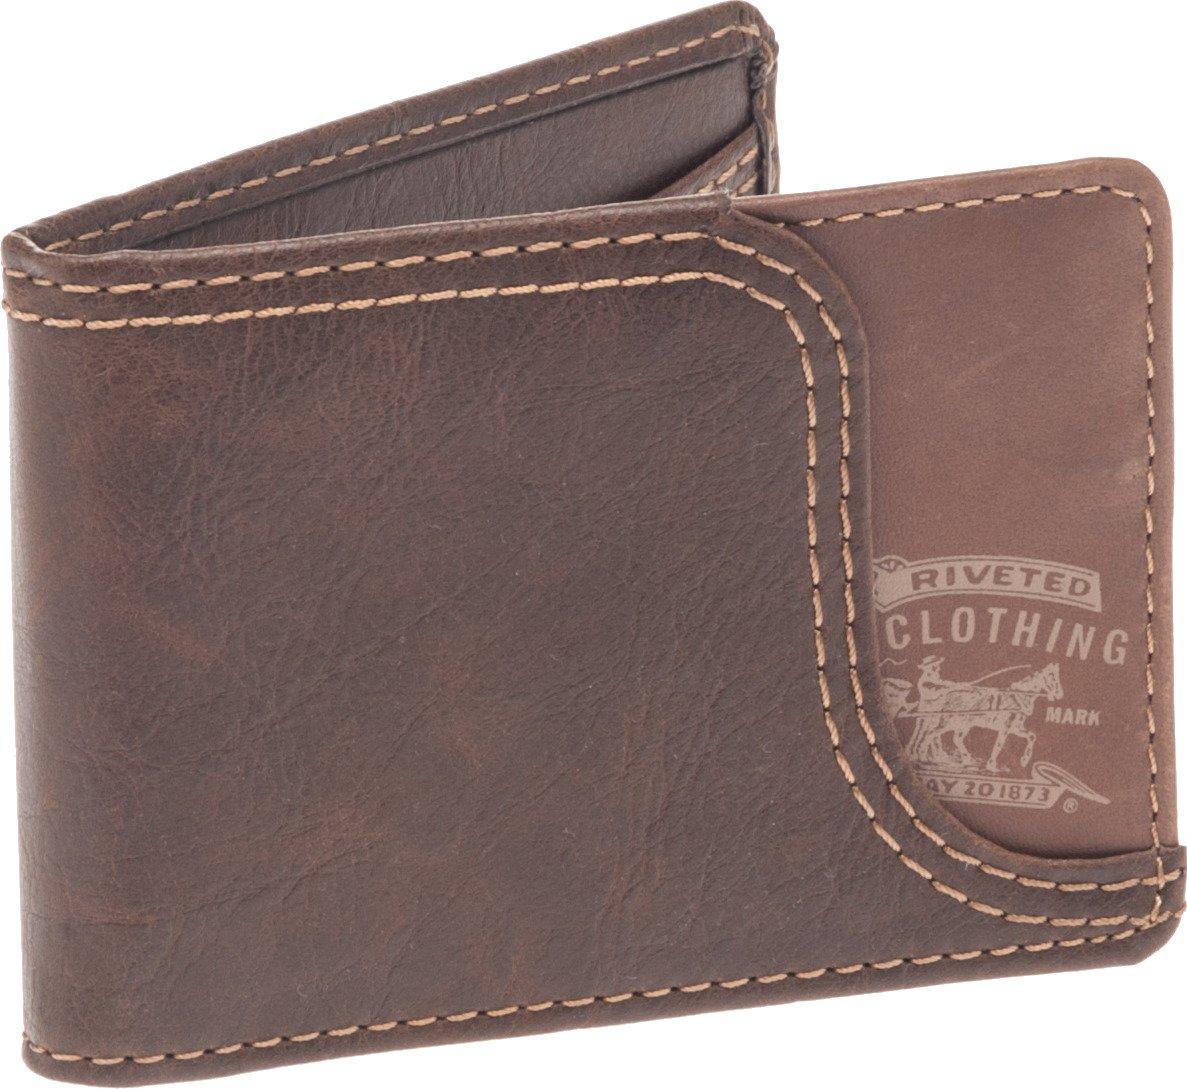 Levi's™ Men's Wallet